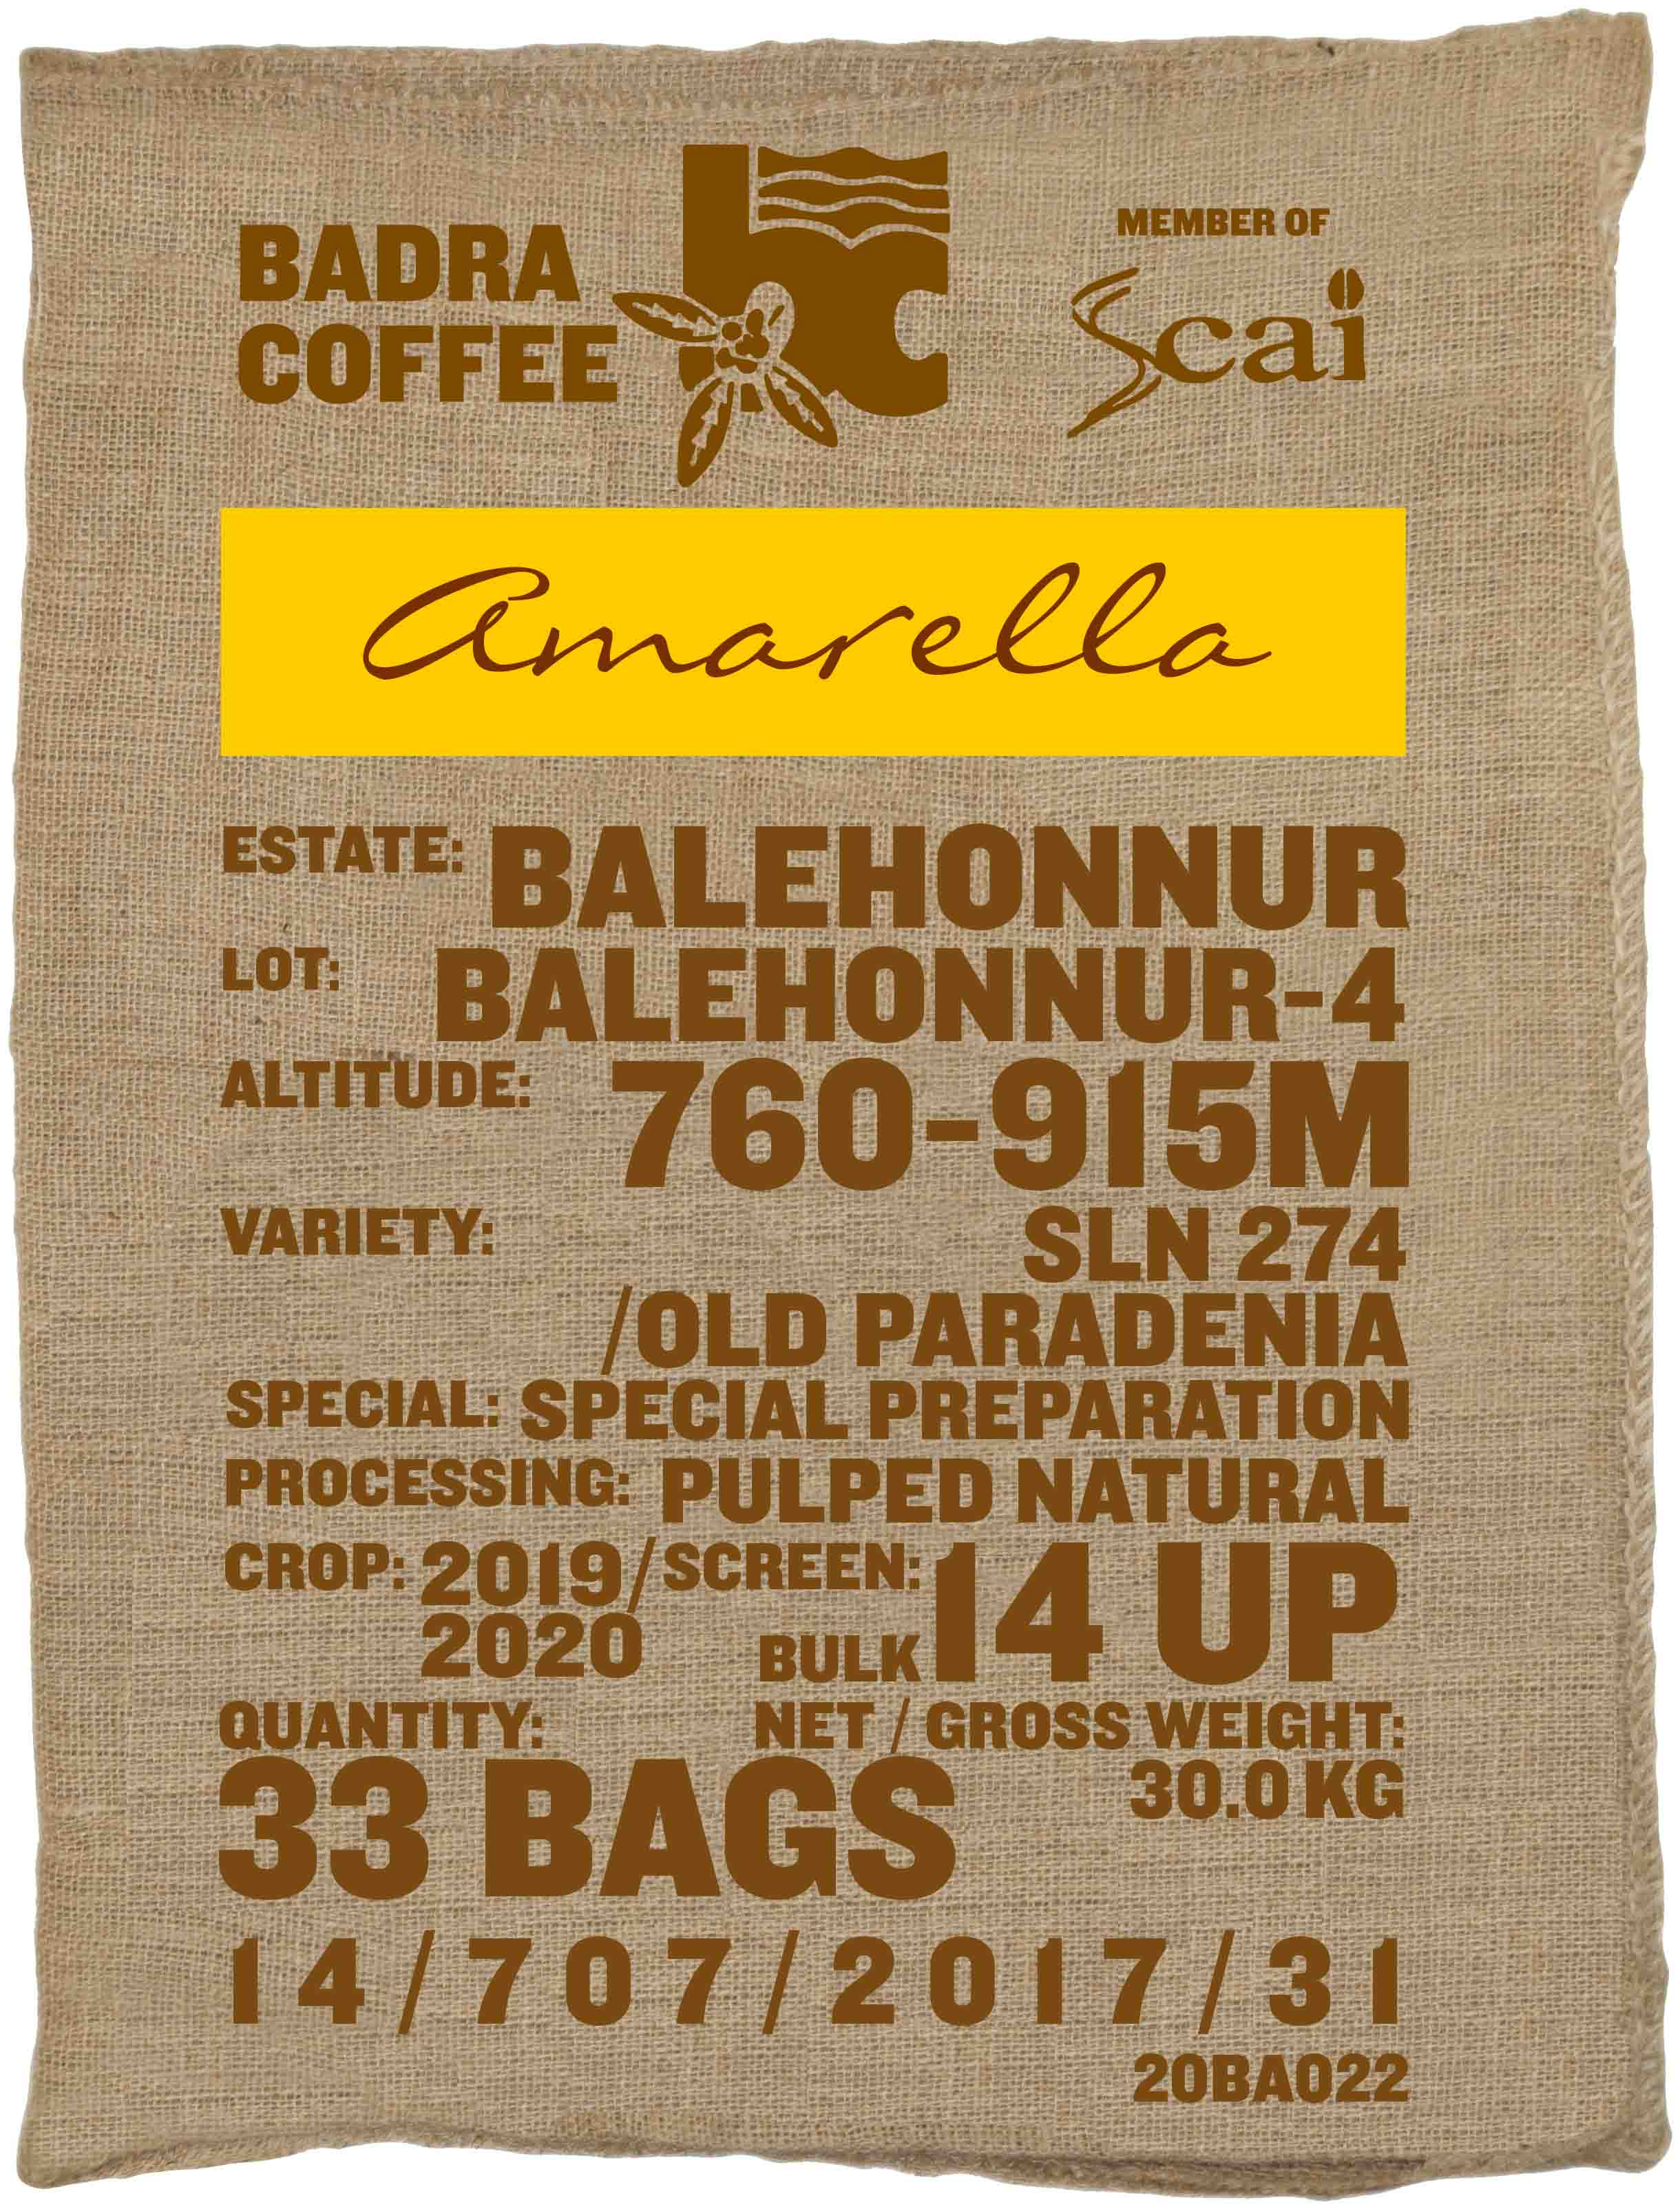 Ein Rohkaffeesack amarella Parzellenkaffee Varietät SLN 274/Old Paradenia. Badra Estates Lot Balehonnur 4.